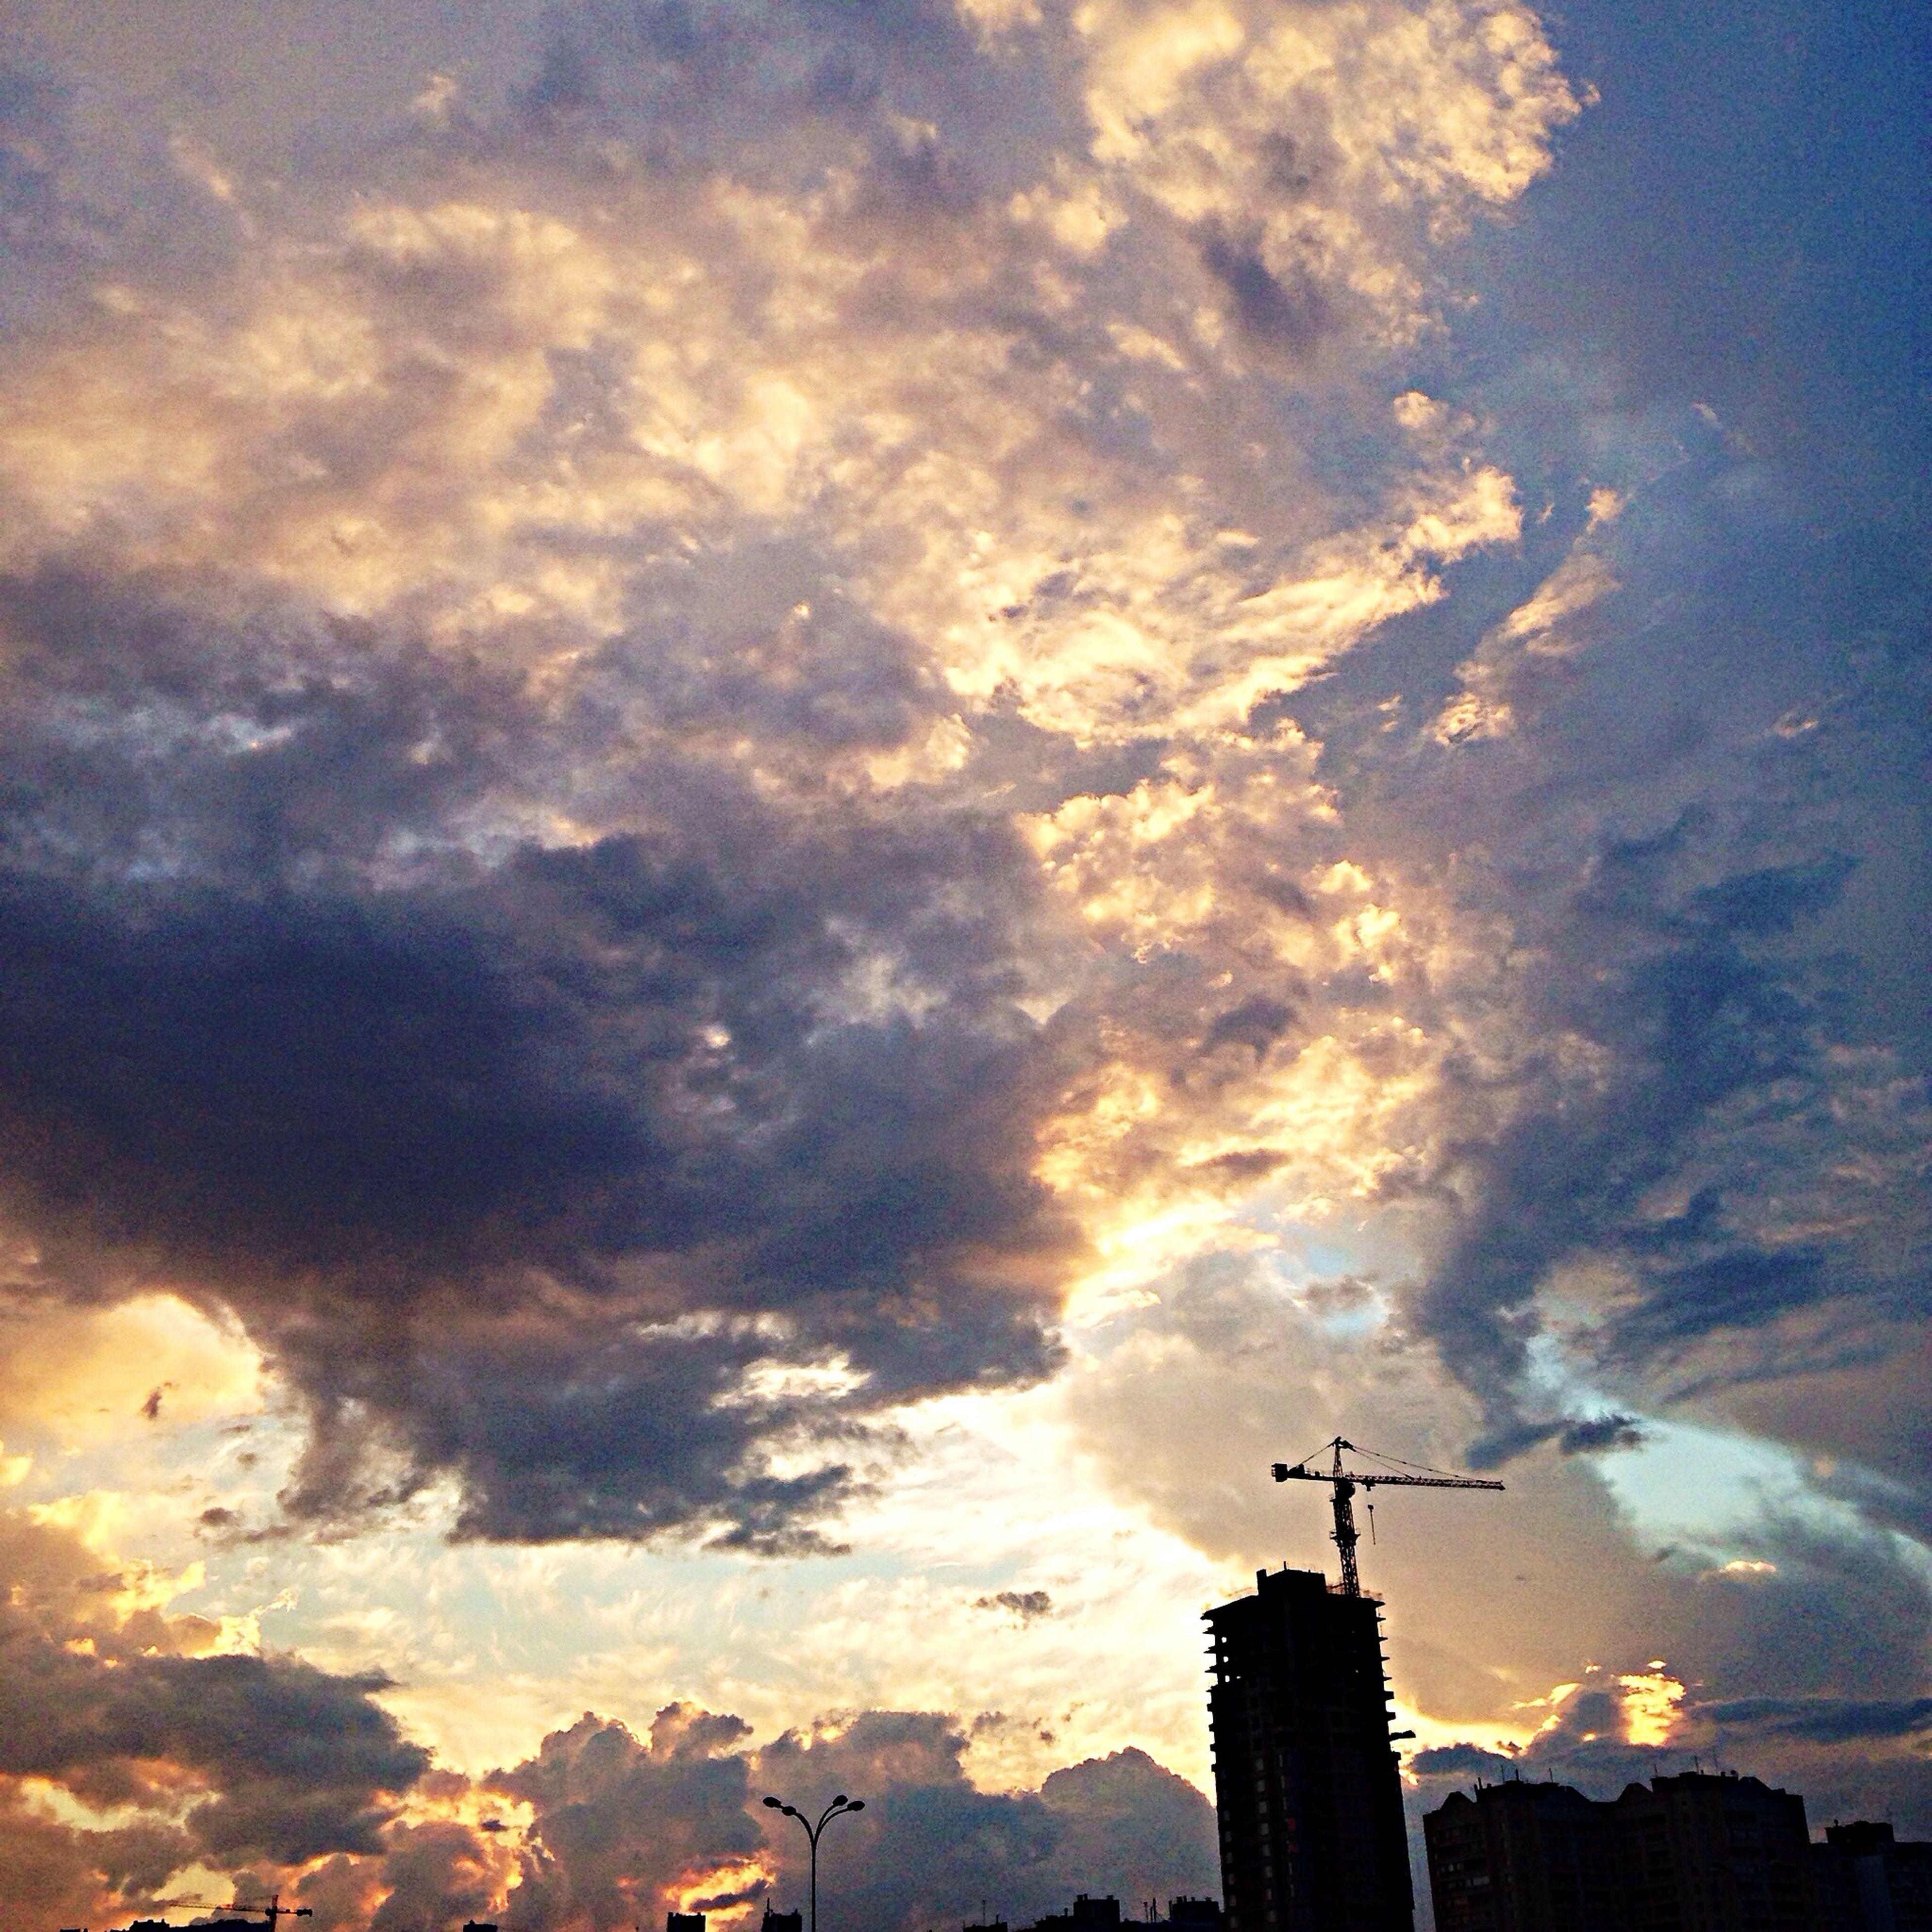 sky, sunset, building exterior, cloud - sky, architecture, built structure, silhouette, cloudy, low angle view, weather, city, cloud, development, dramatic sky, crane - construction machinery, nature, outdoors, no people, orange color, dusk